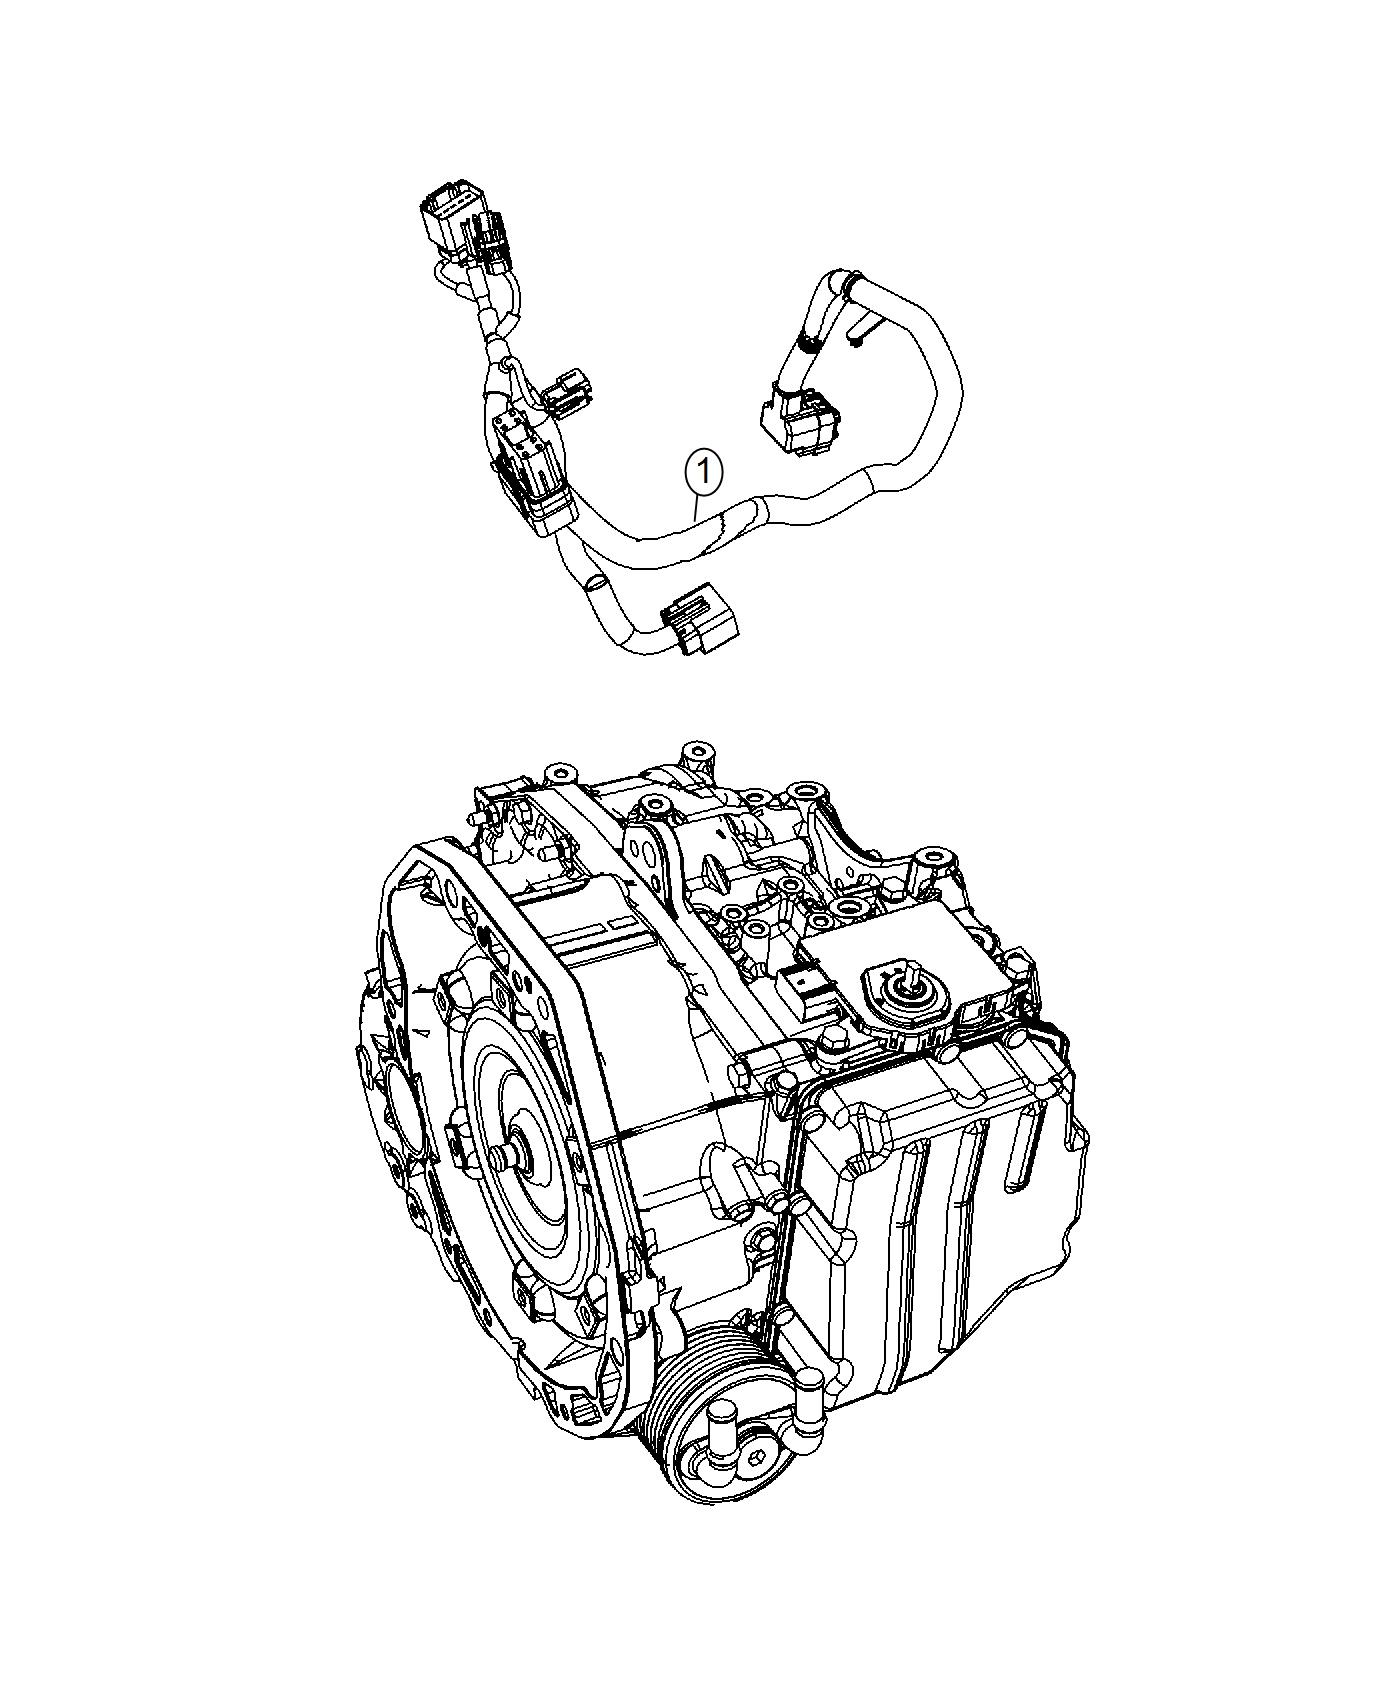 Fiat 500c Wiring Transmission Transfer Mopar Cases